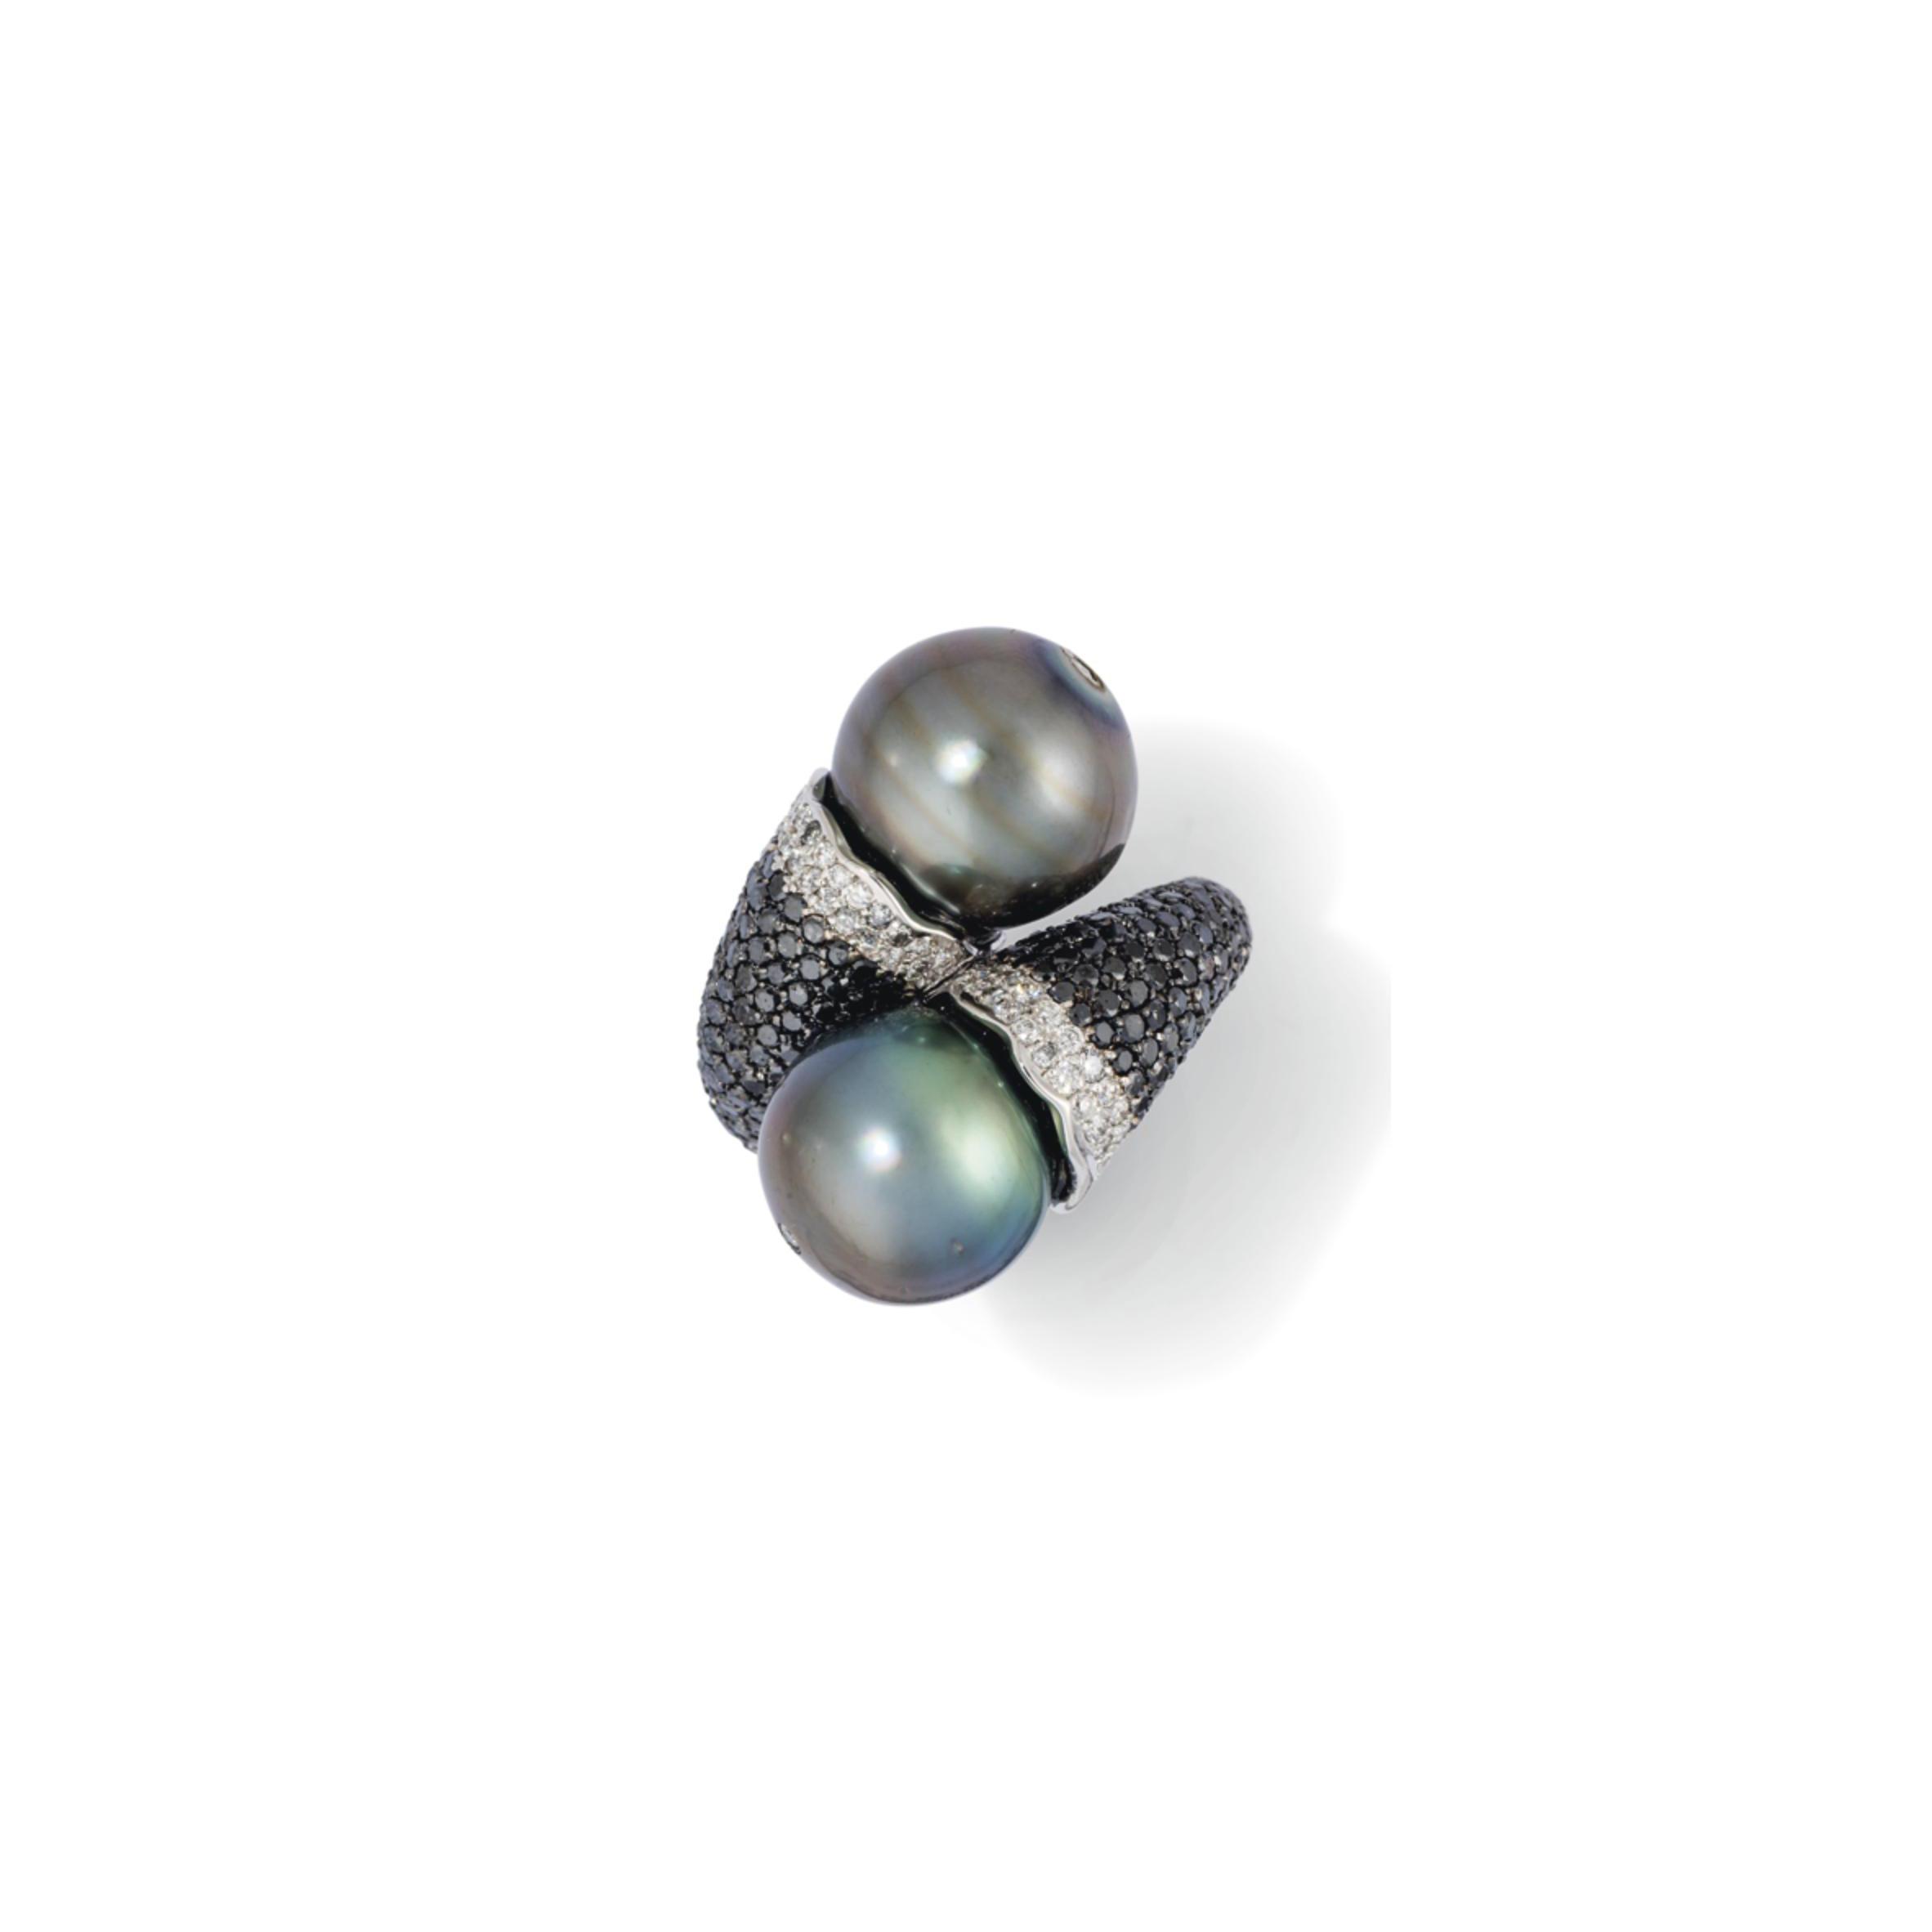 FIVE DIAMOND, COLOURED DIAMOND AND GEM DRESS RINGS